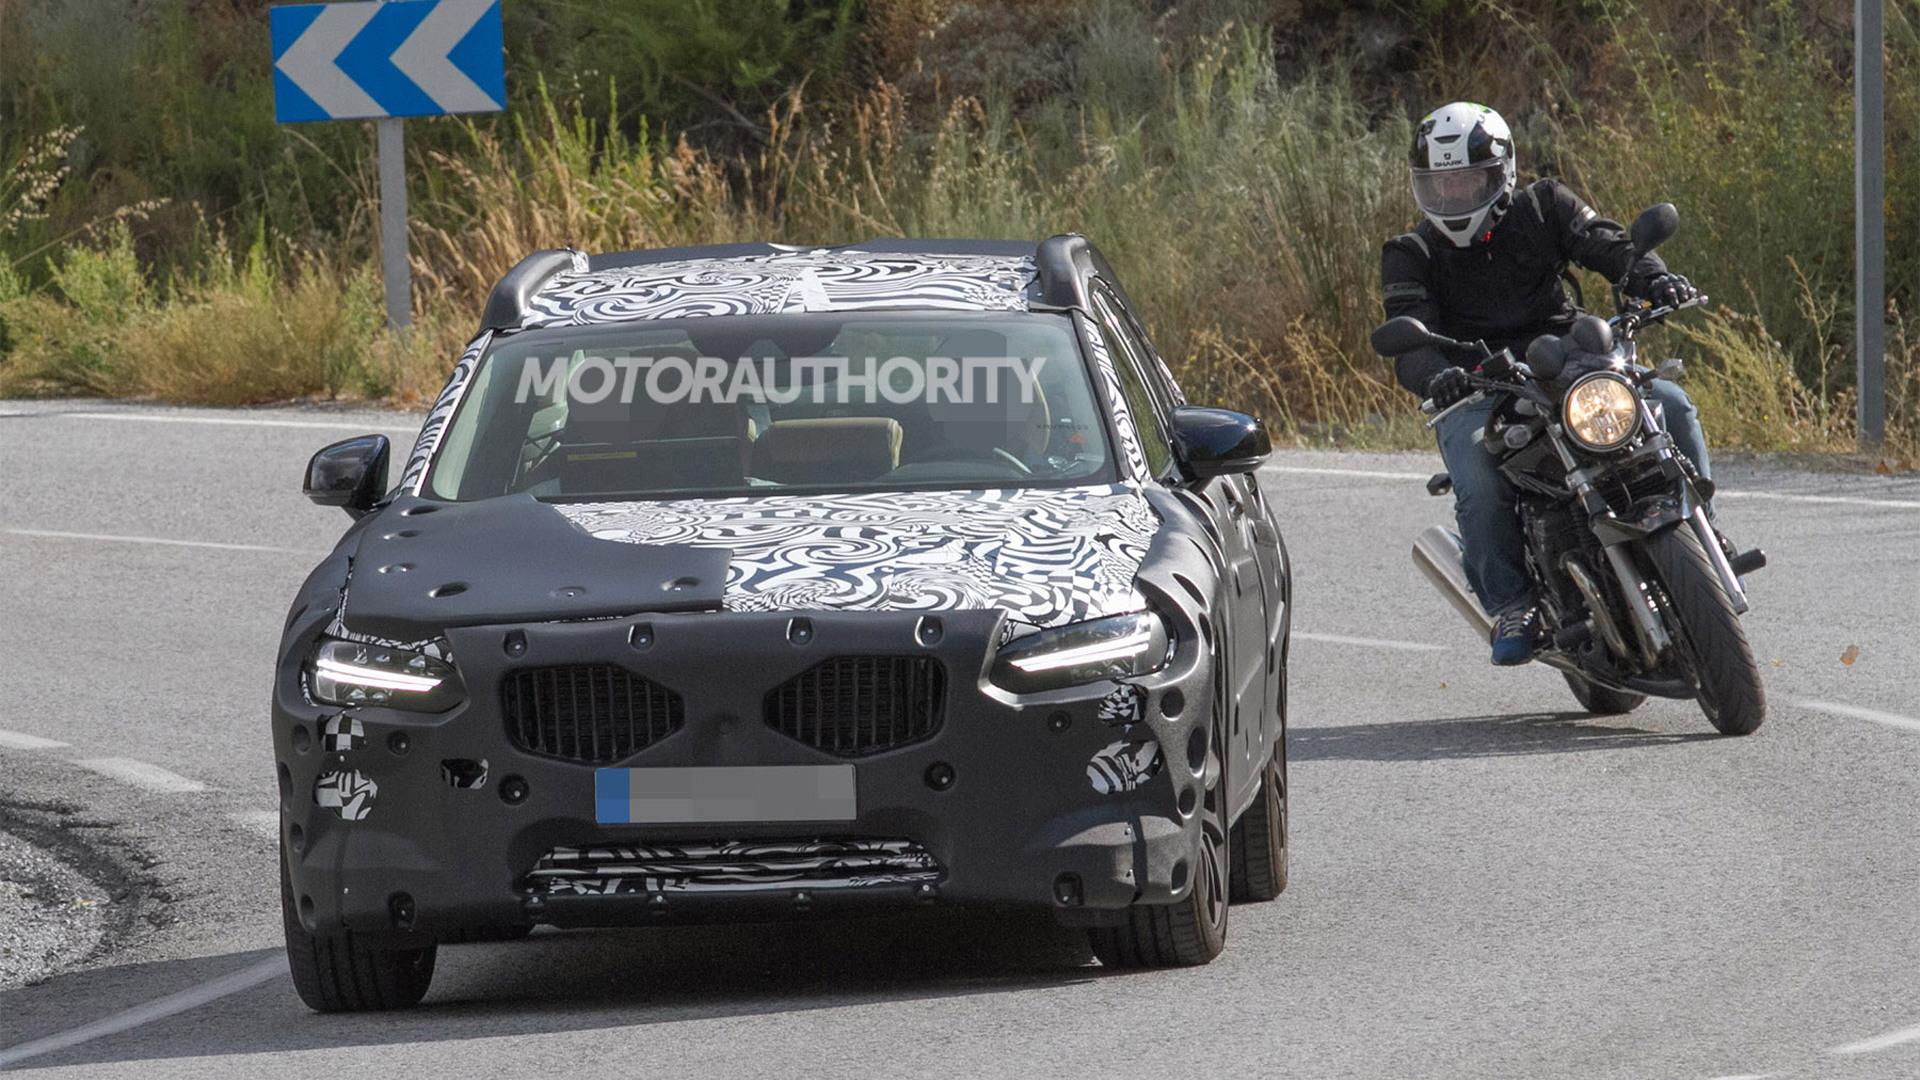 2017 Volvo S90 spy shots - Image via S. Baldauf/SB-Medien